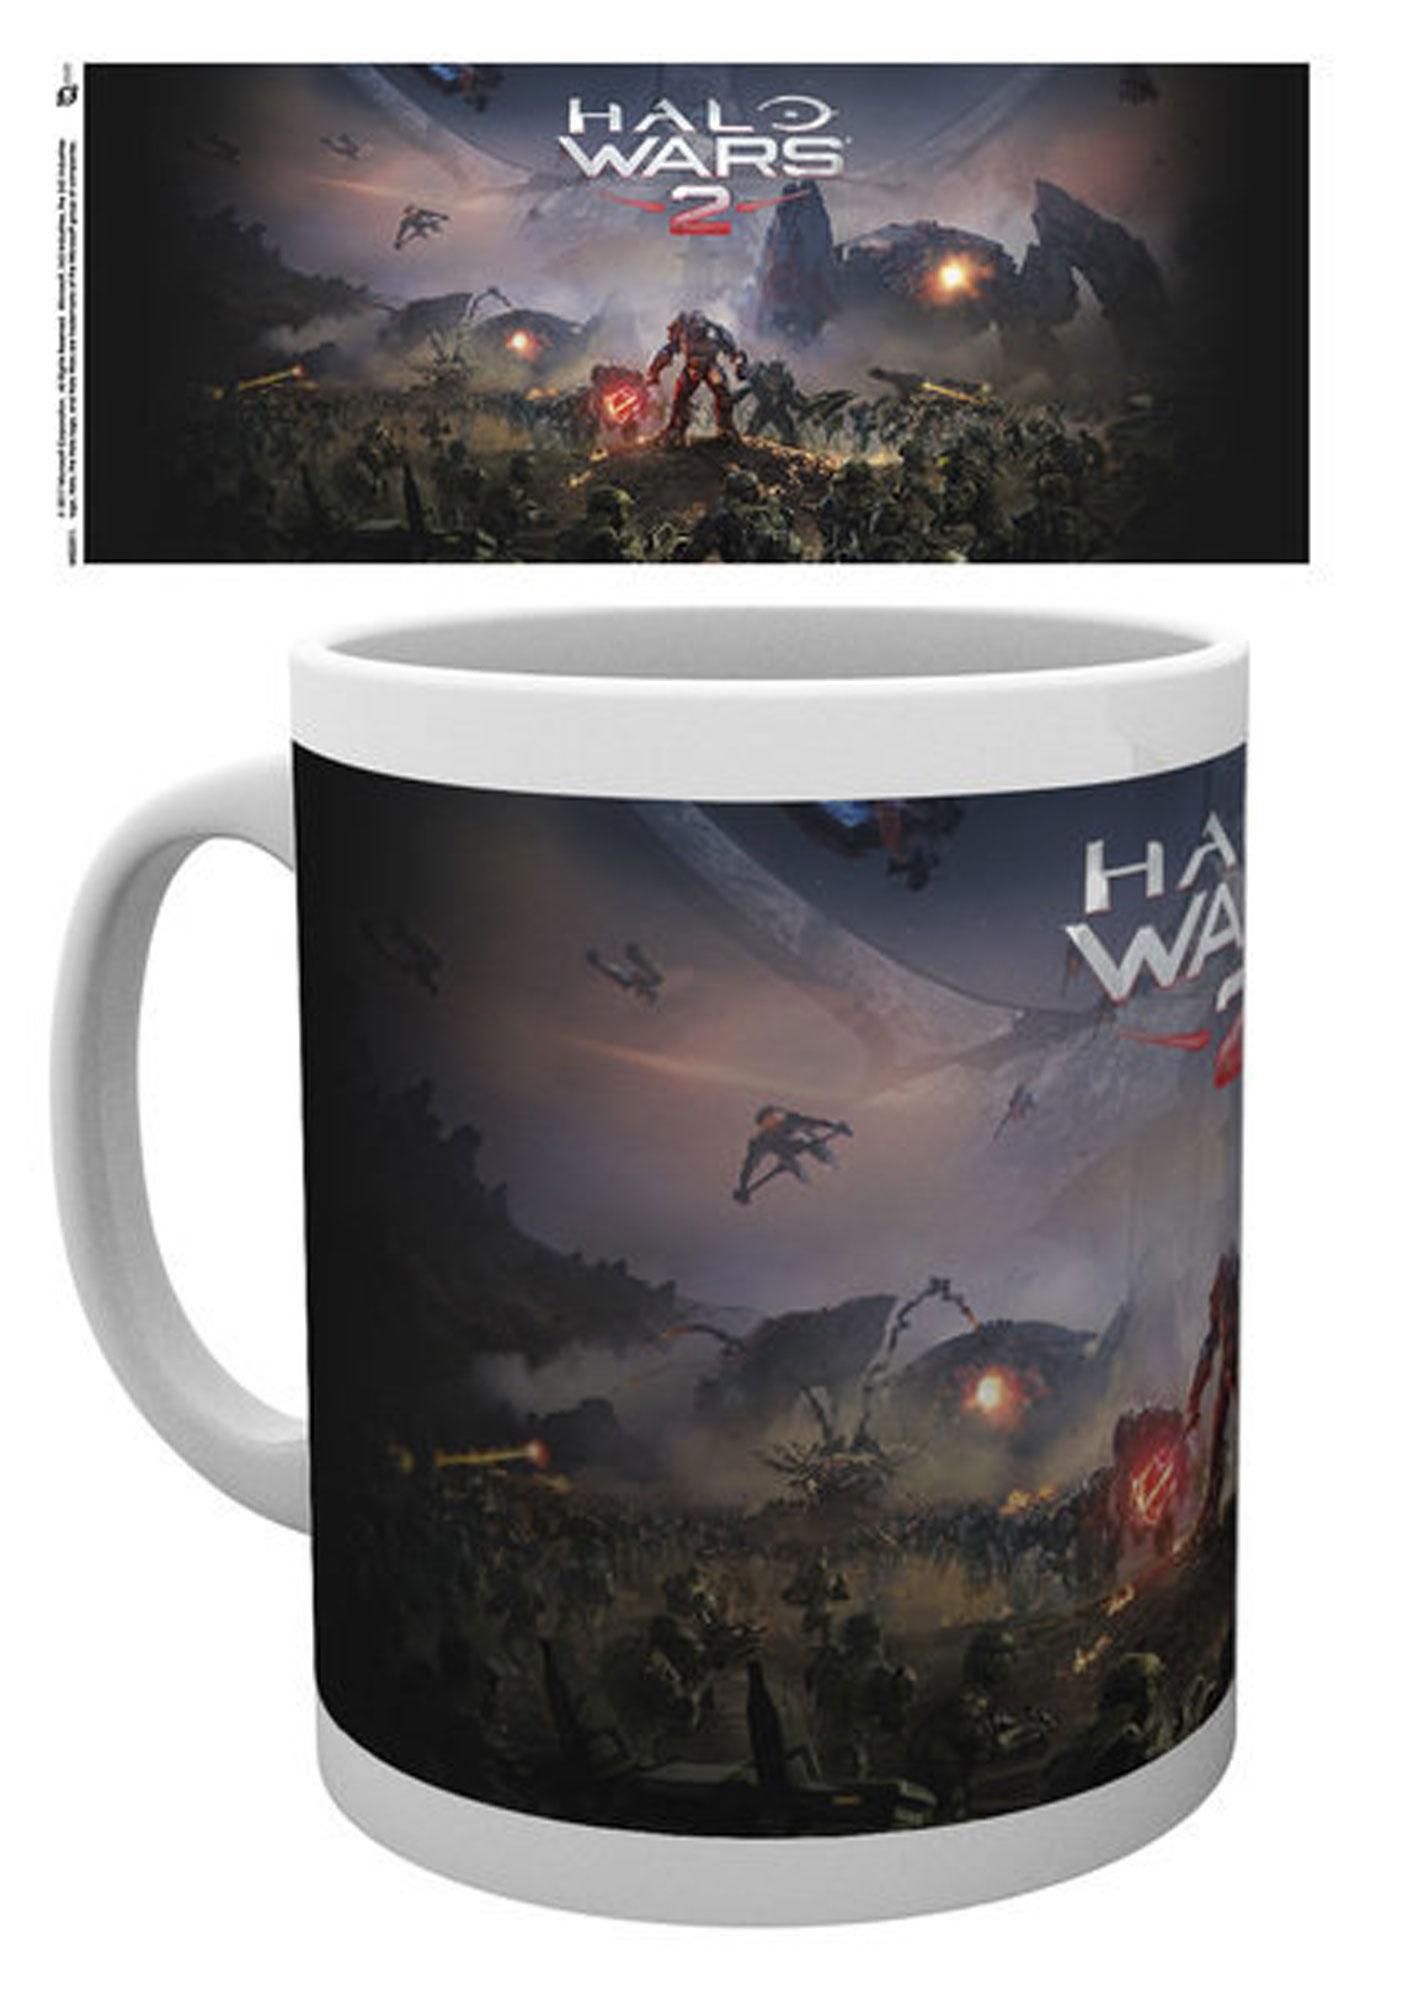 Größe Ø8,5 H9,5cm Keramik Tasse Halo Wars 2 Key Art